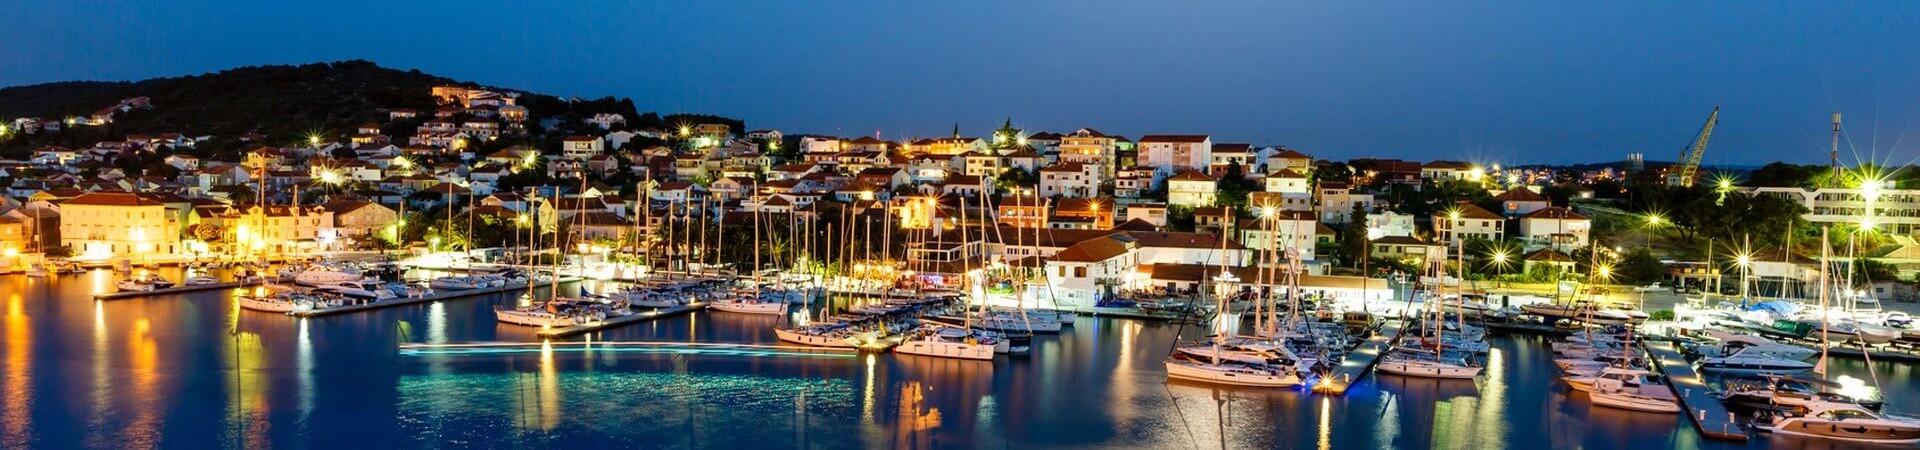 Port w Ciovo noca